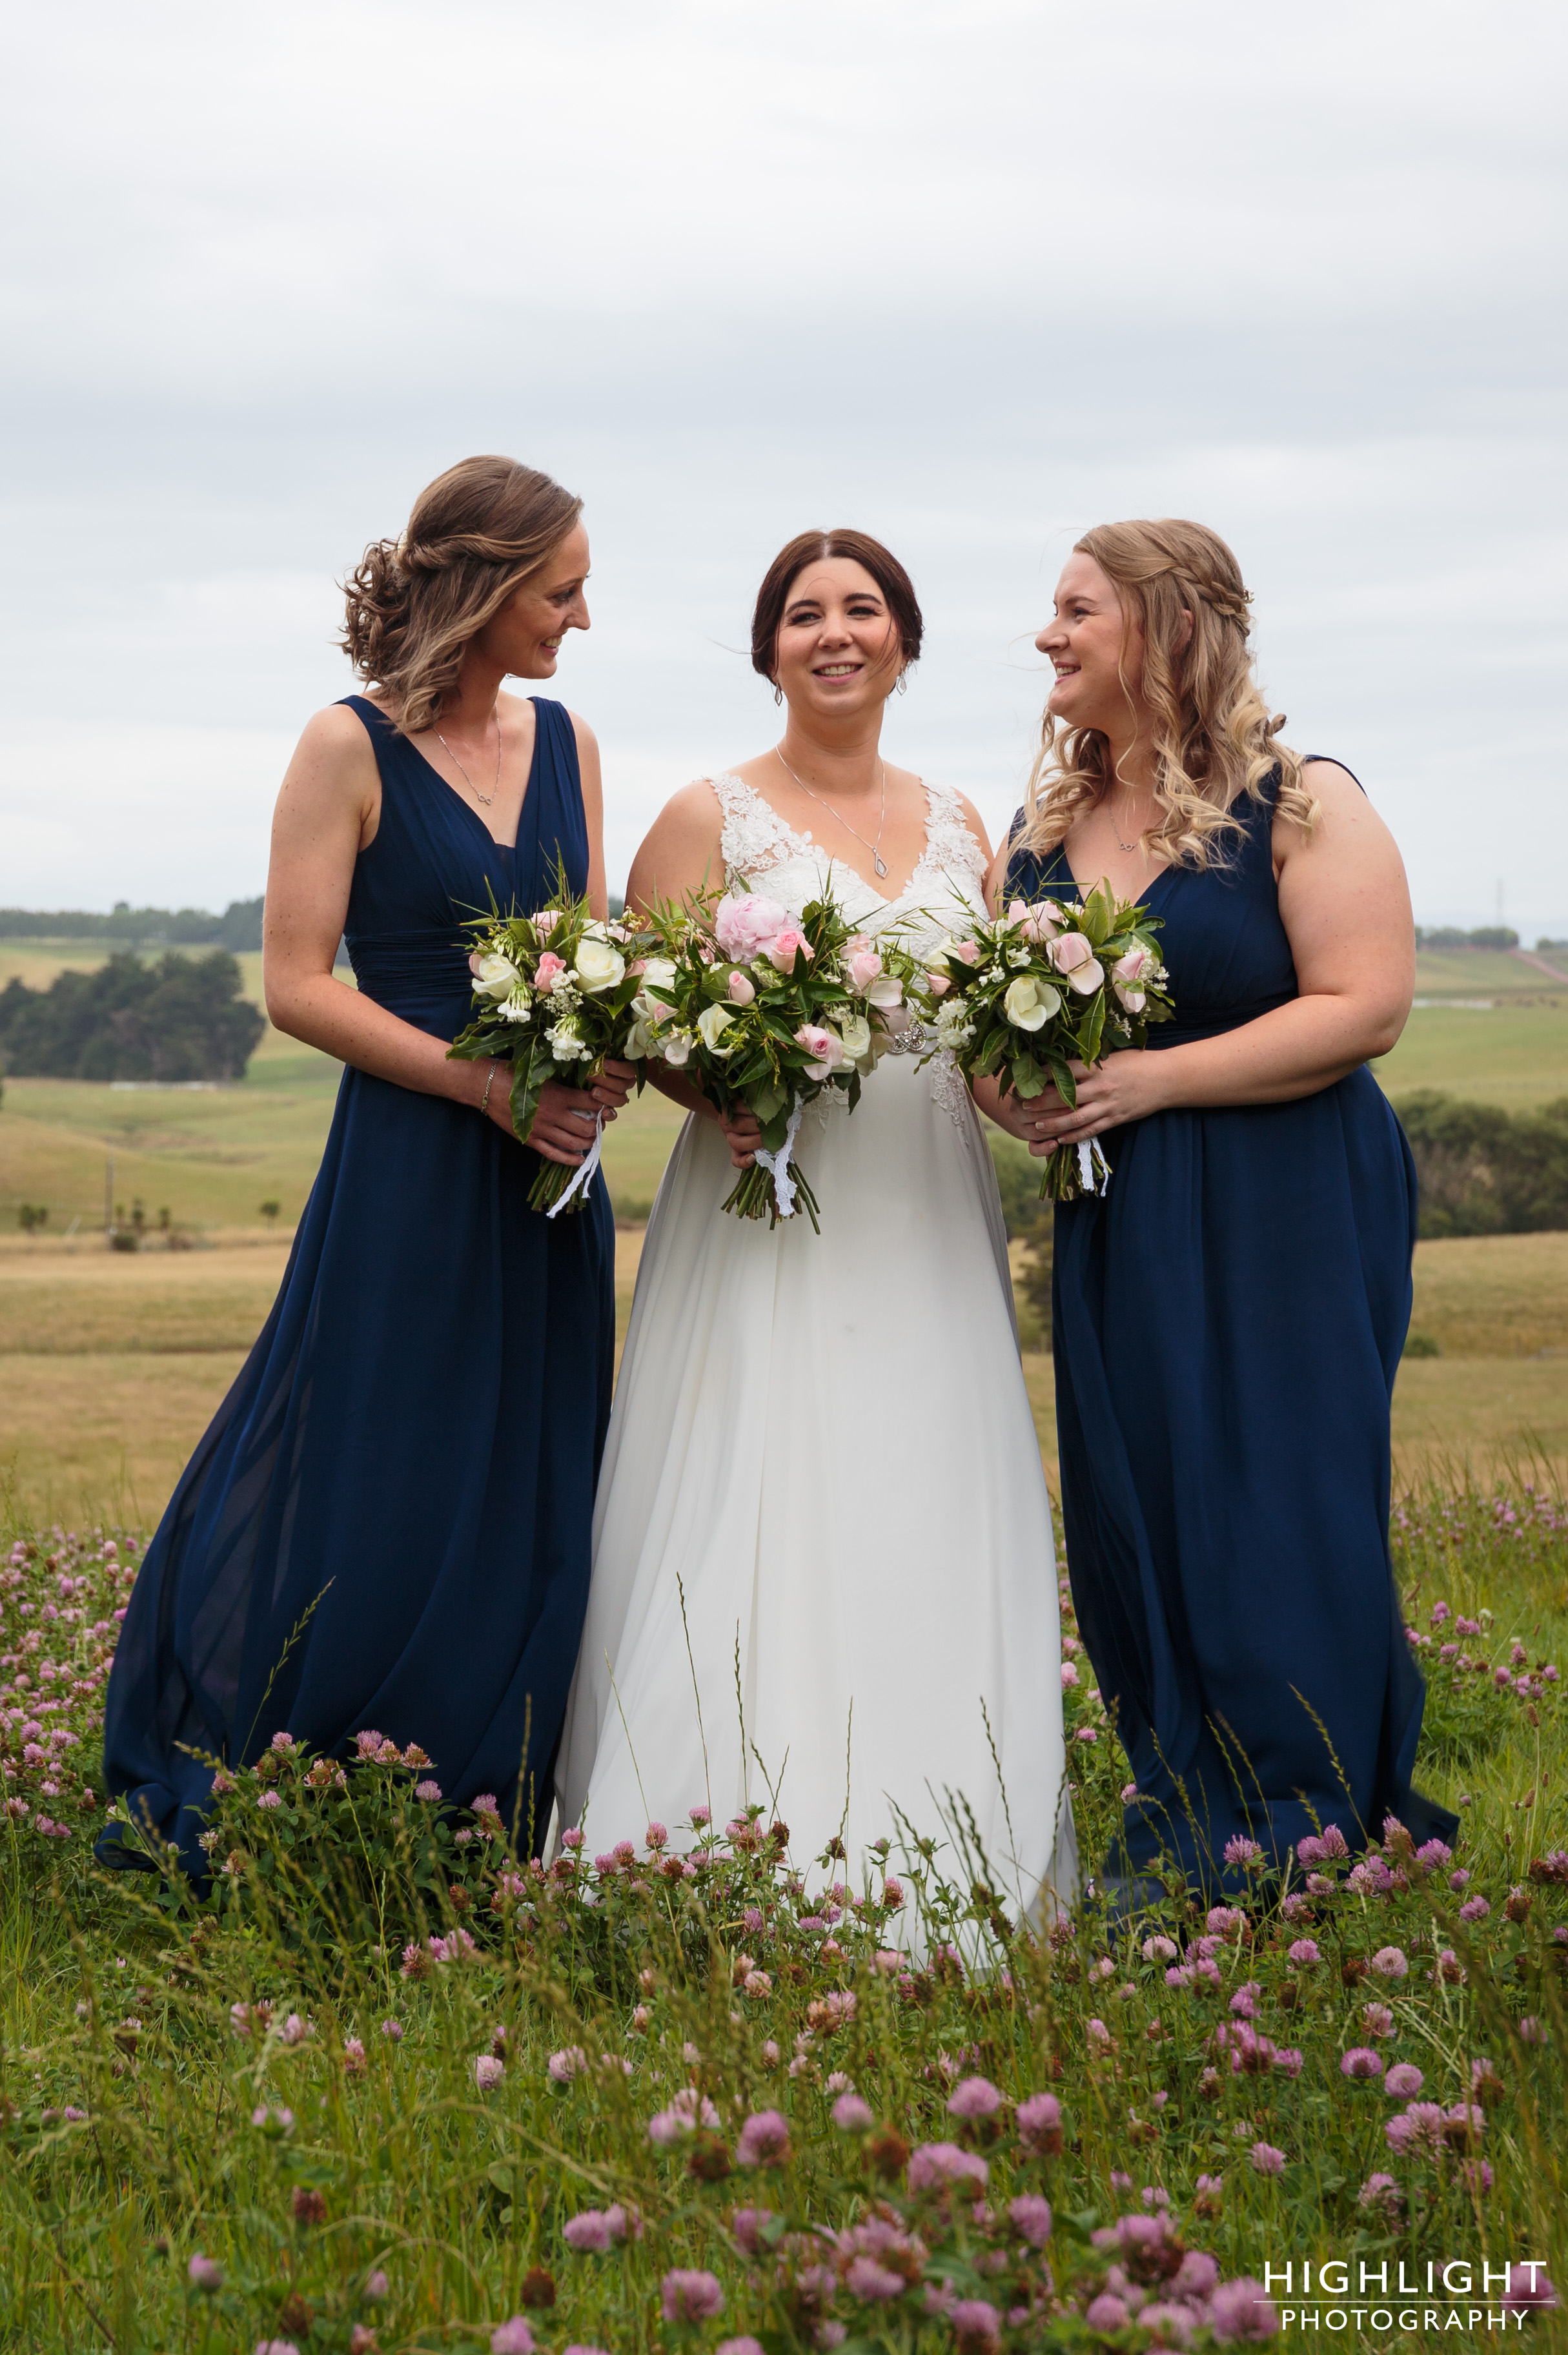 JM-2017-Highlight-wedding-photography-palmerston-north-new-zealand-116.jpg